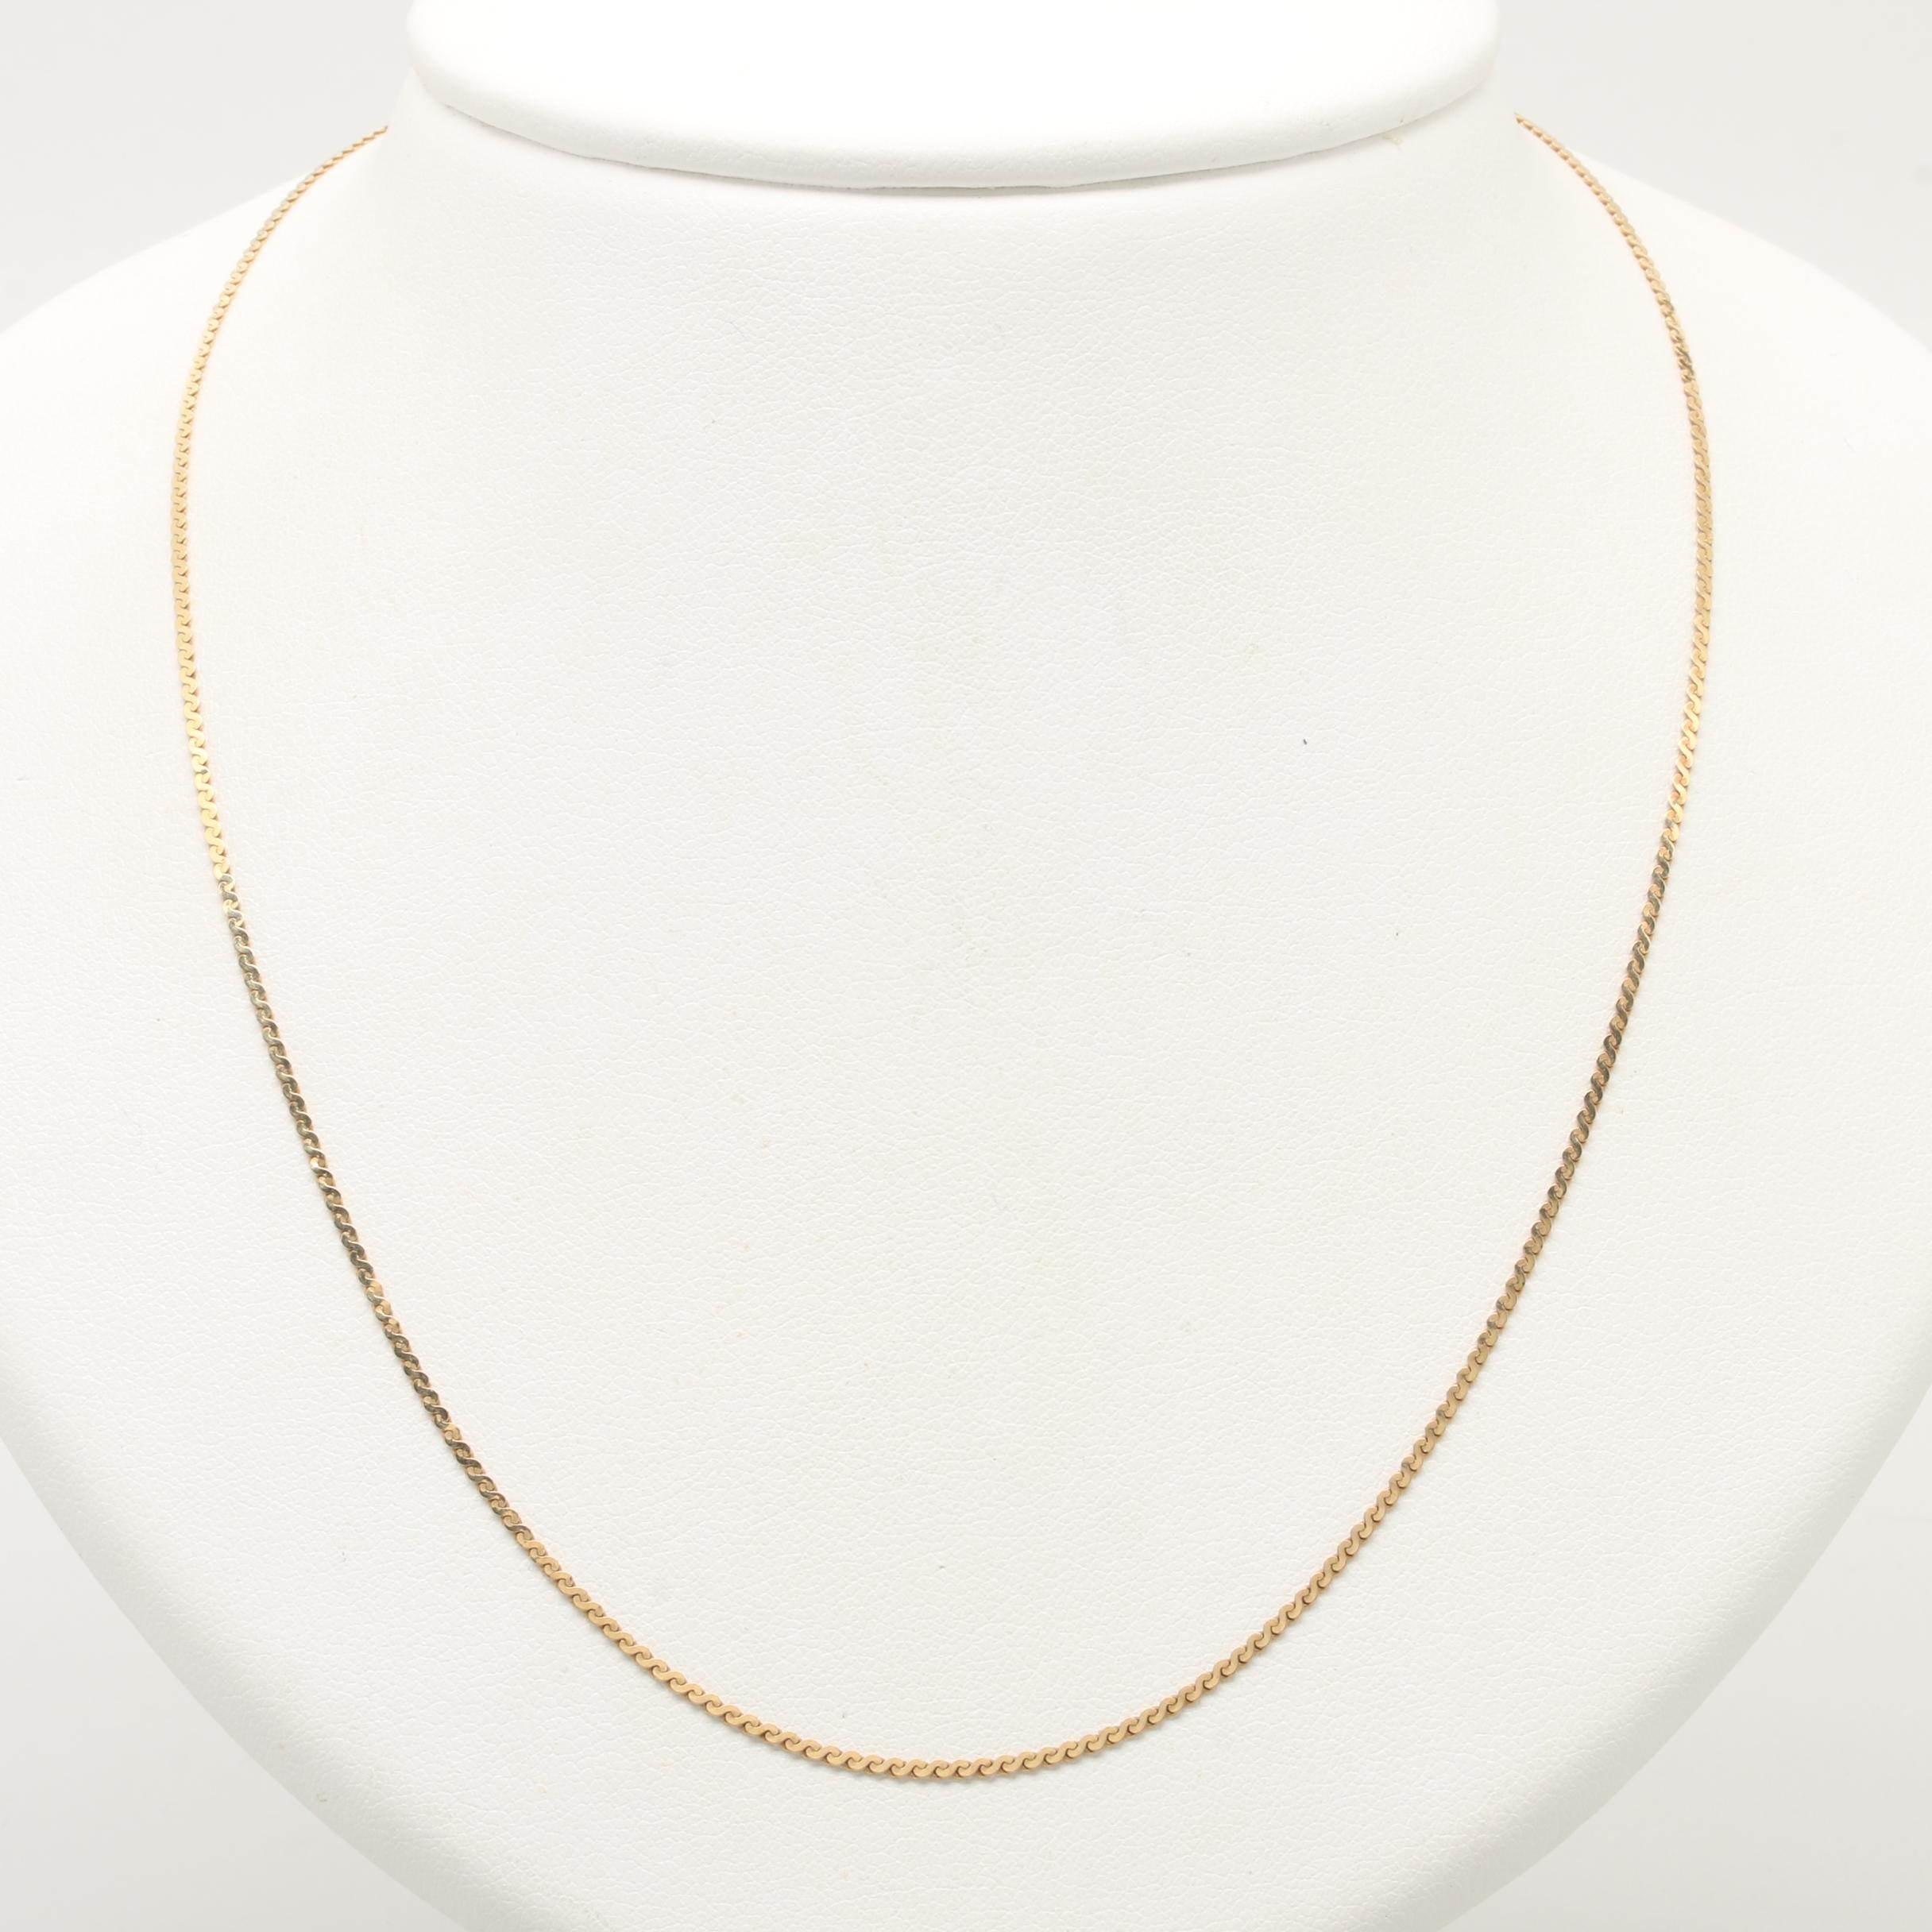 Italian 14K Yellow Gold Serpentine Chain Necklace